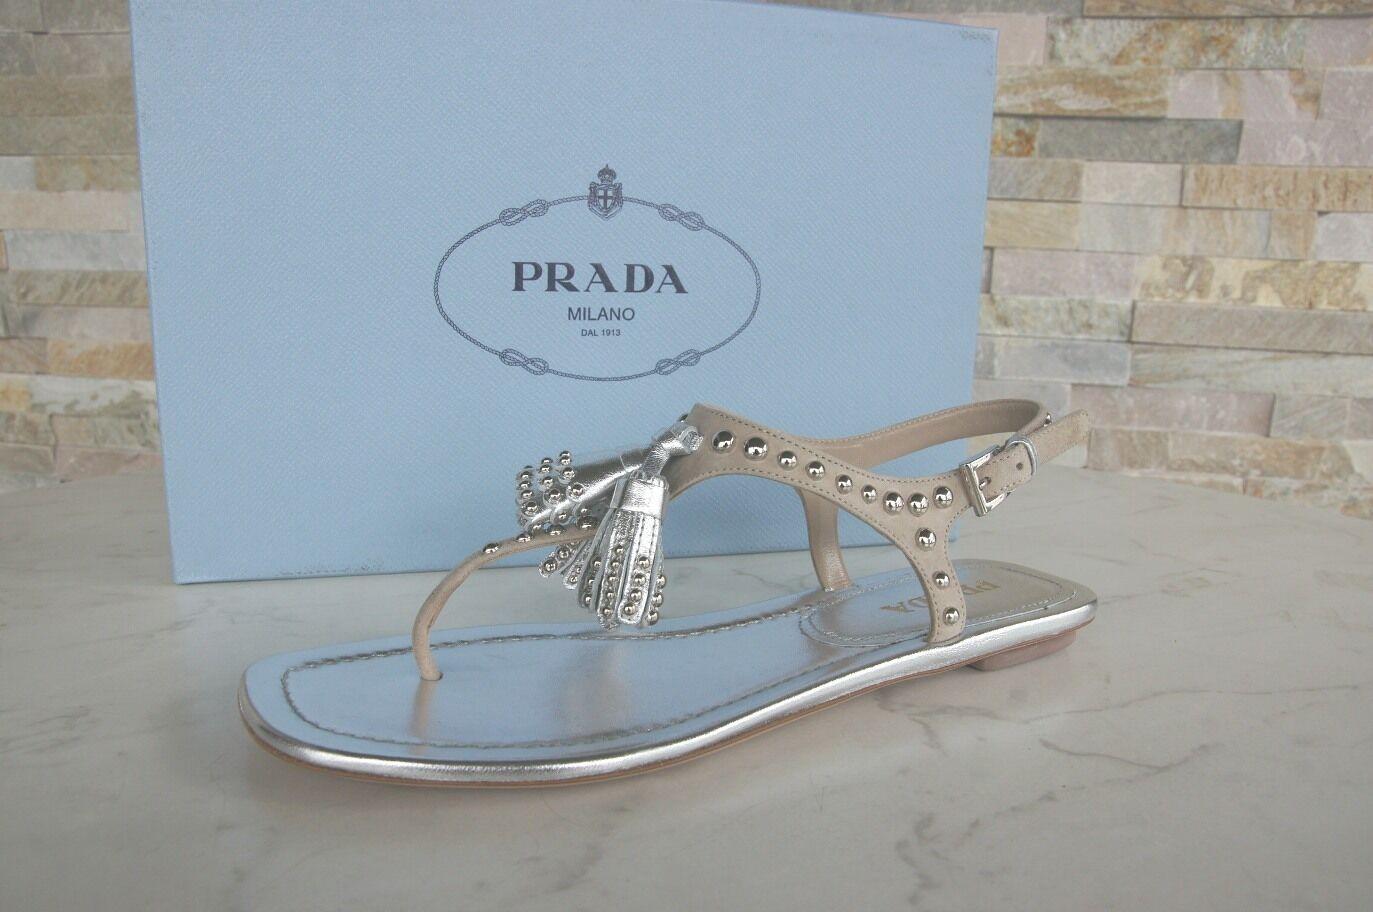 Prada talla 36,5 dedos zapatos sandalias, zapatos zapatos zapatos cuarzo plata borlas nuevo ex PVP  servicio honesto